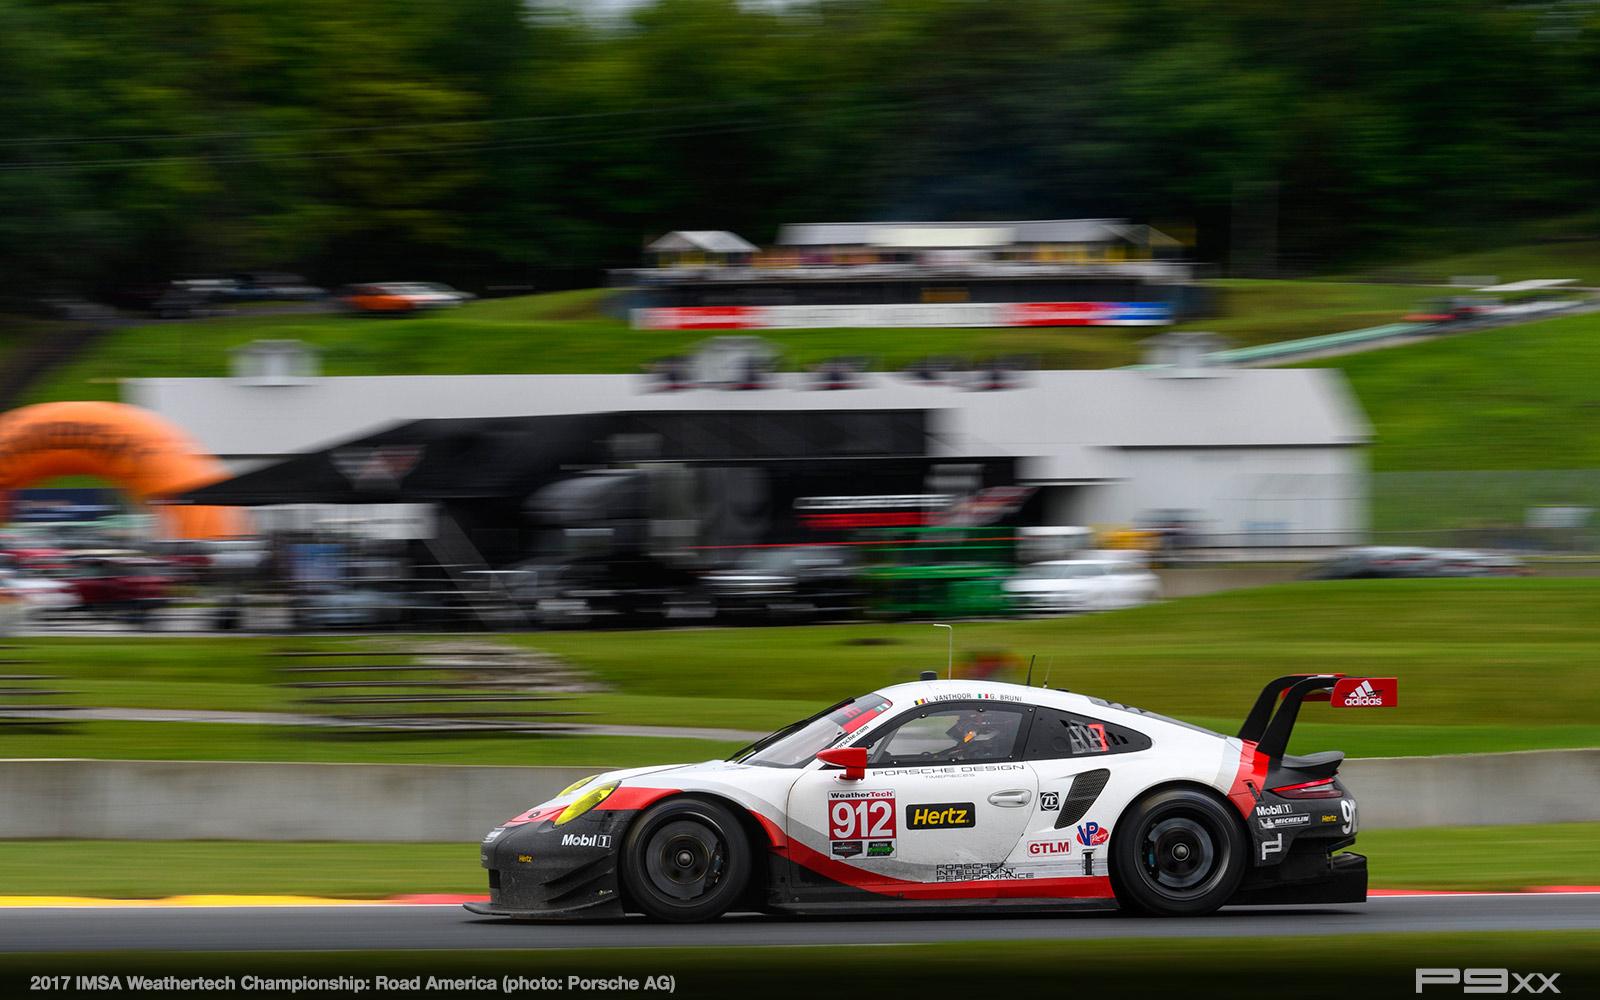 2017-IMSA-Weathertech-Road-America-Porsche-295